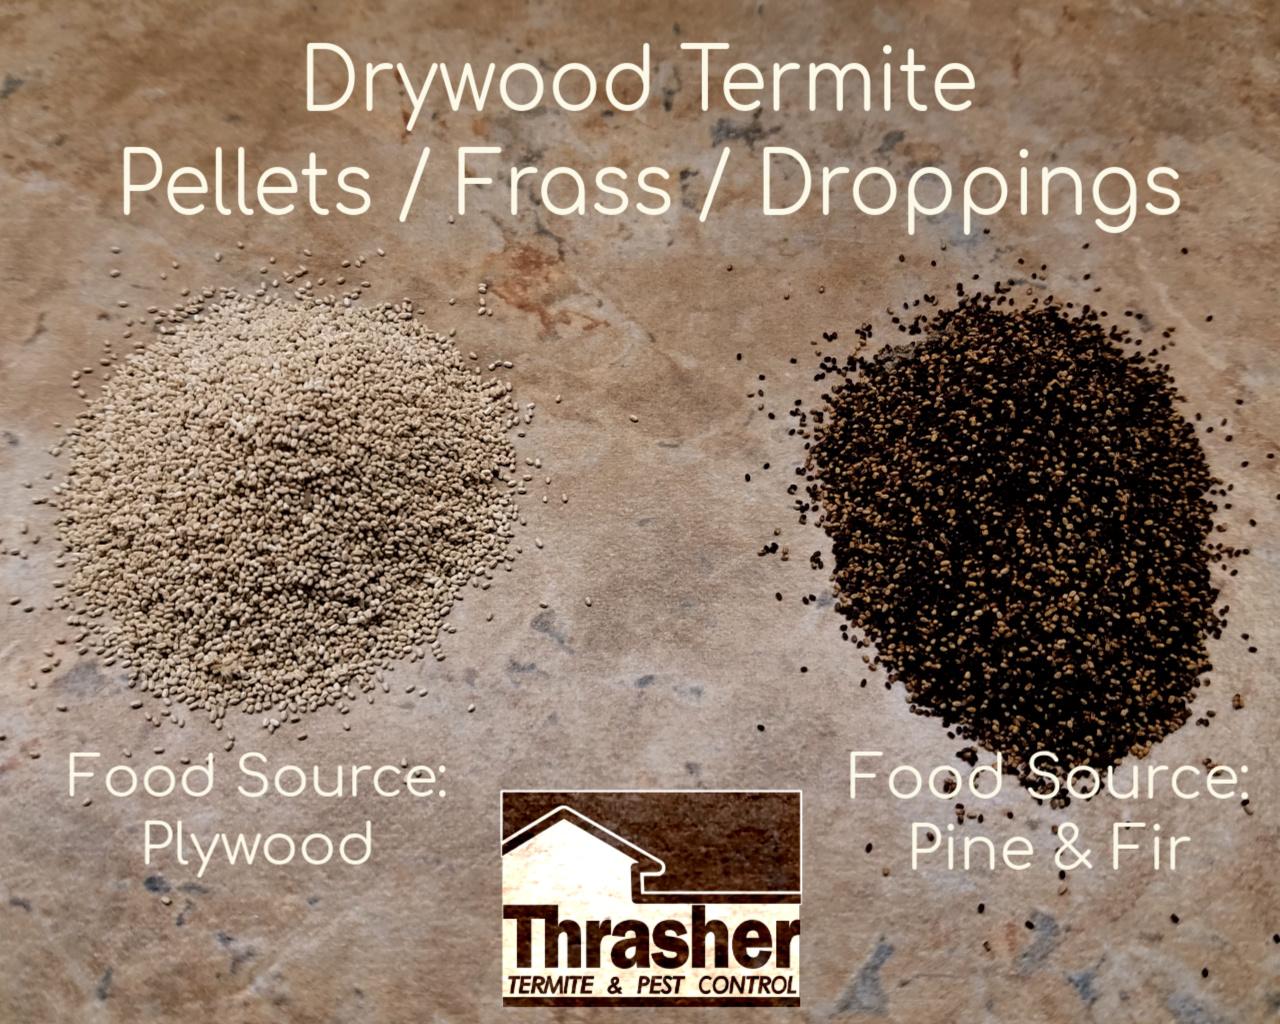 Drywood Termite Droppings Comparison